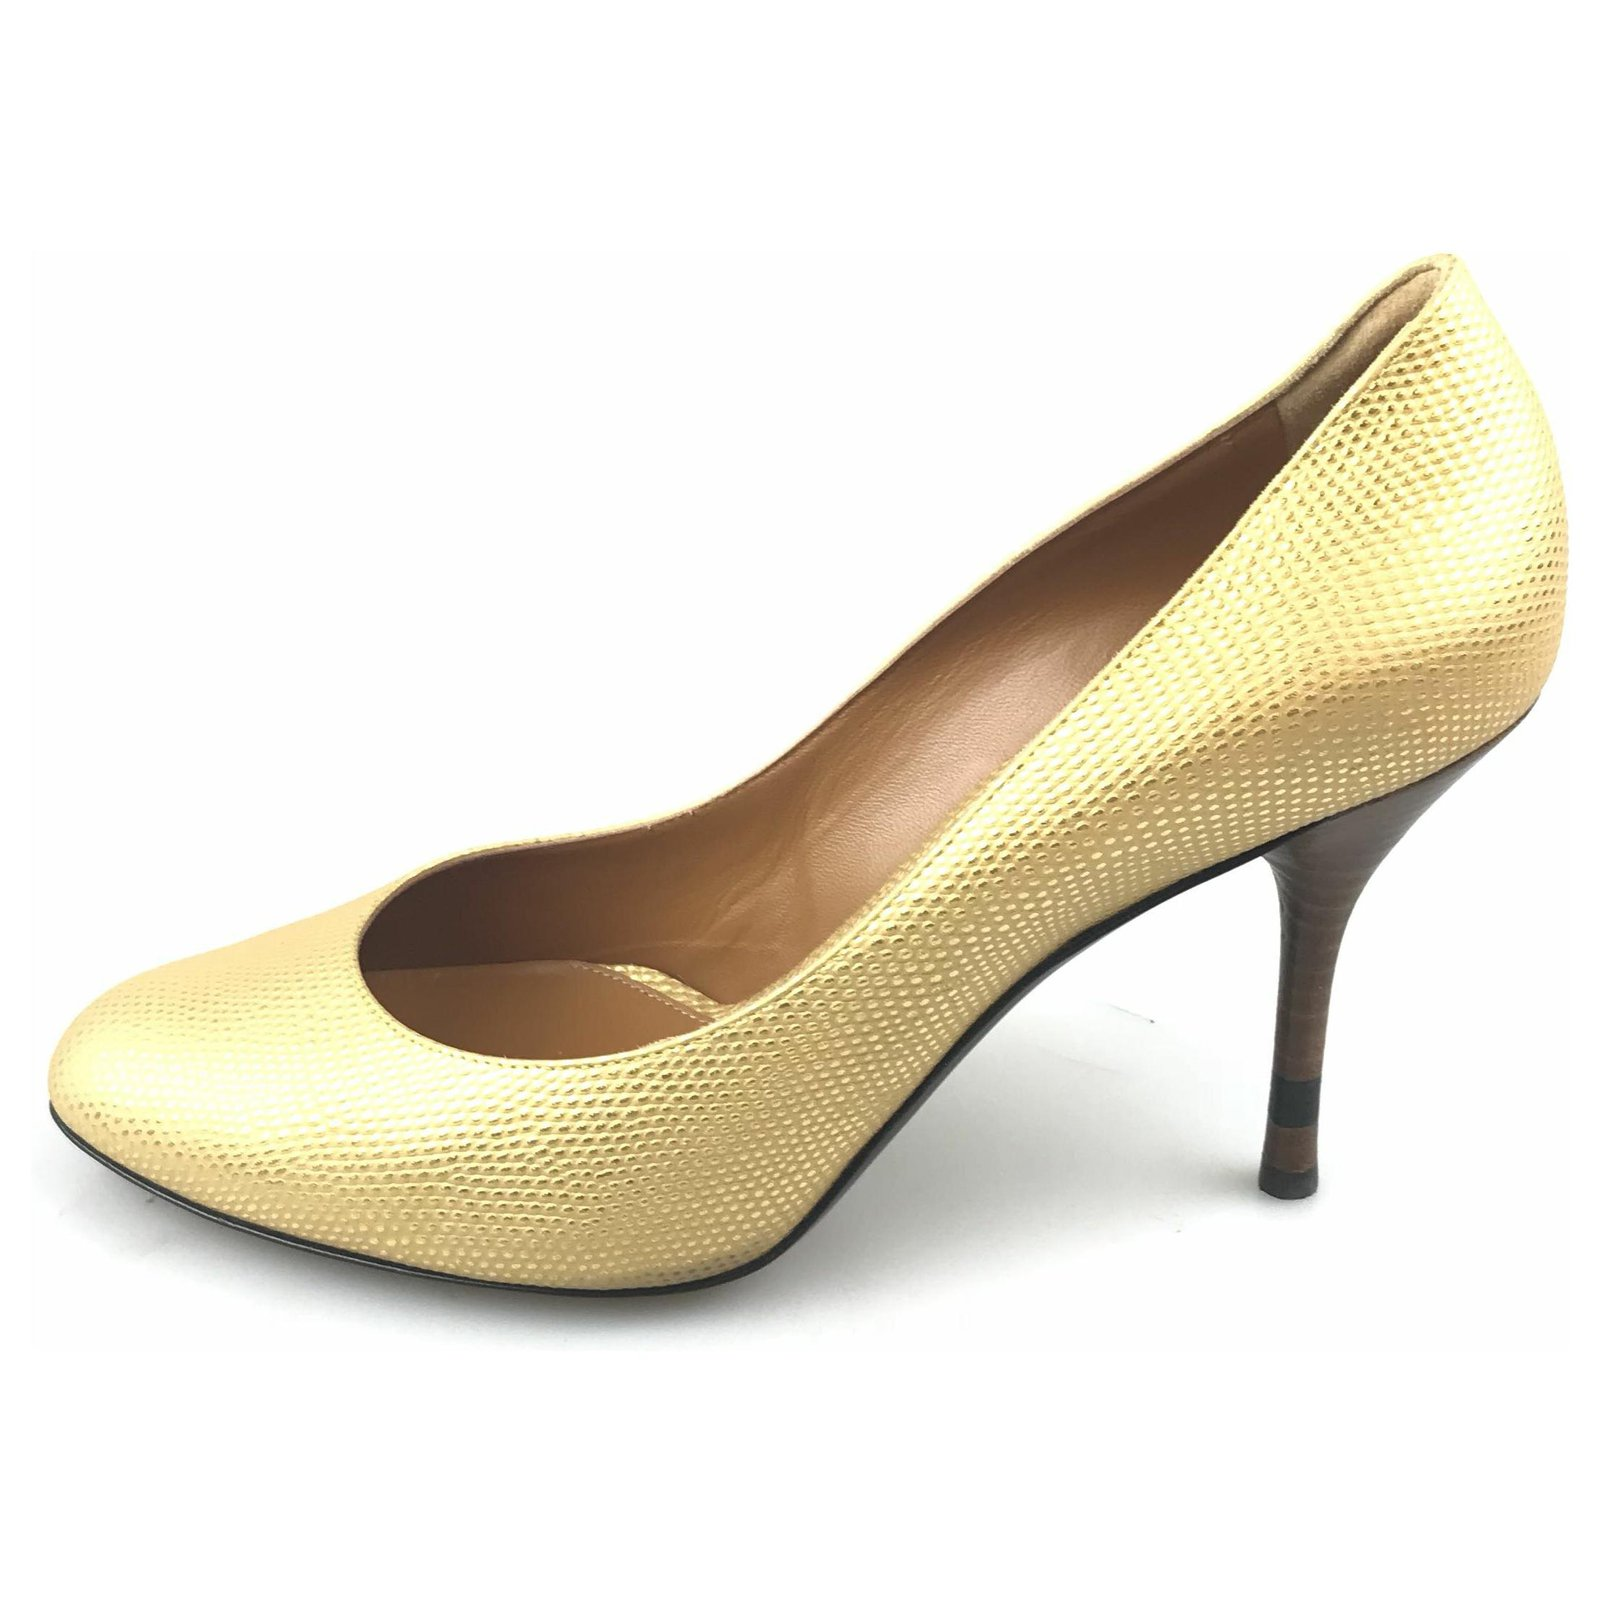 Escarpin Fendi en cuir métallisé doré